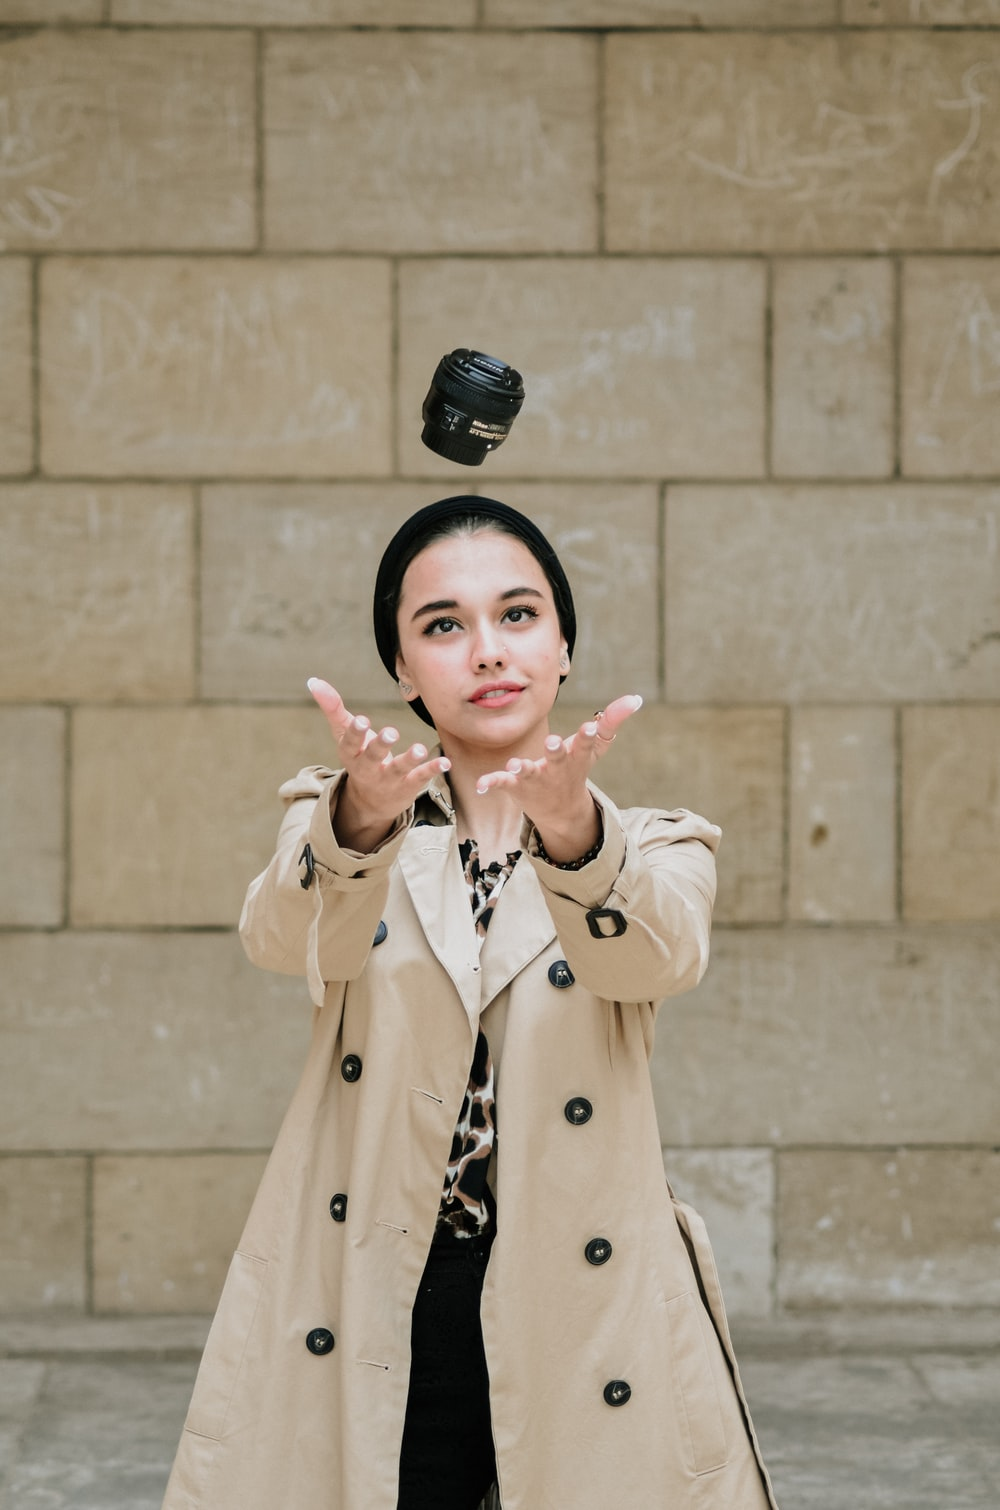 woman holding camera lens